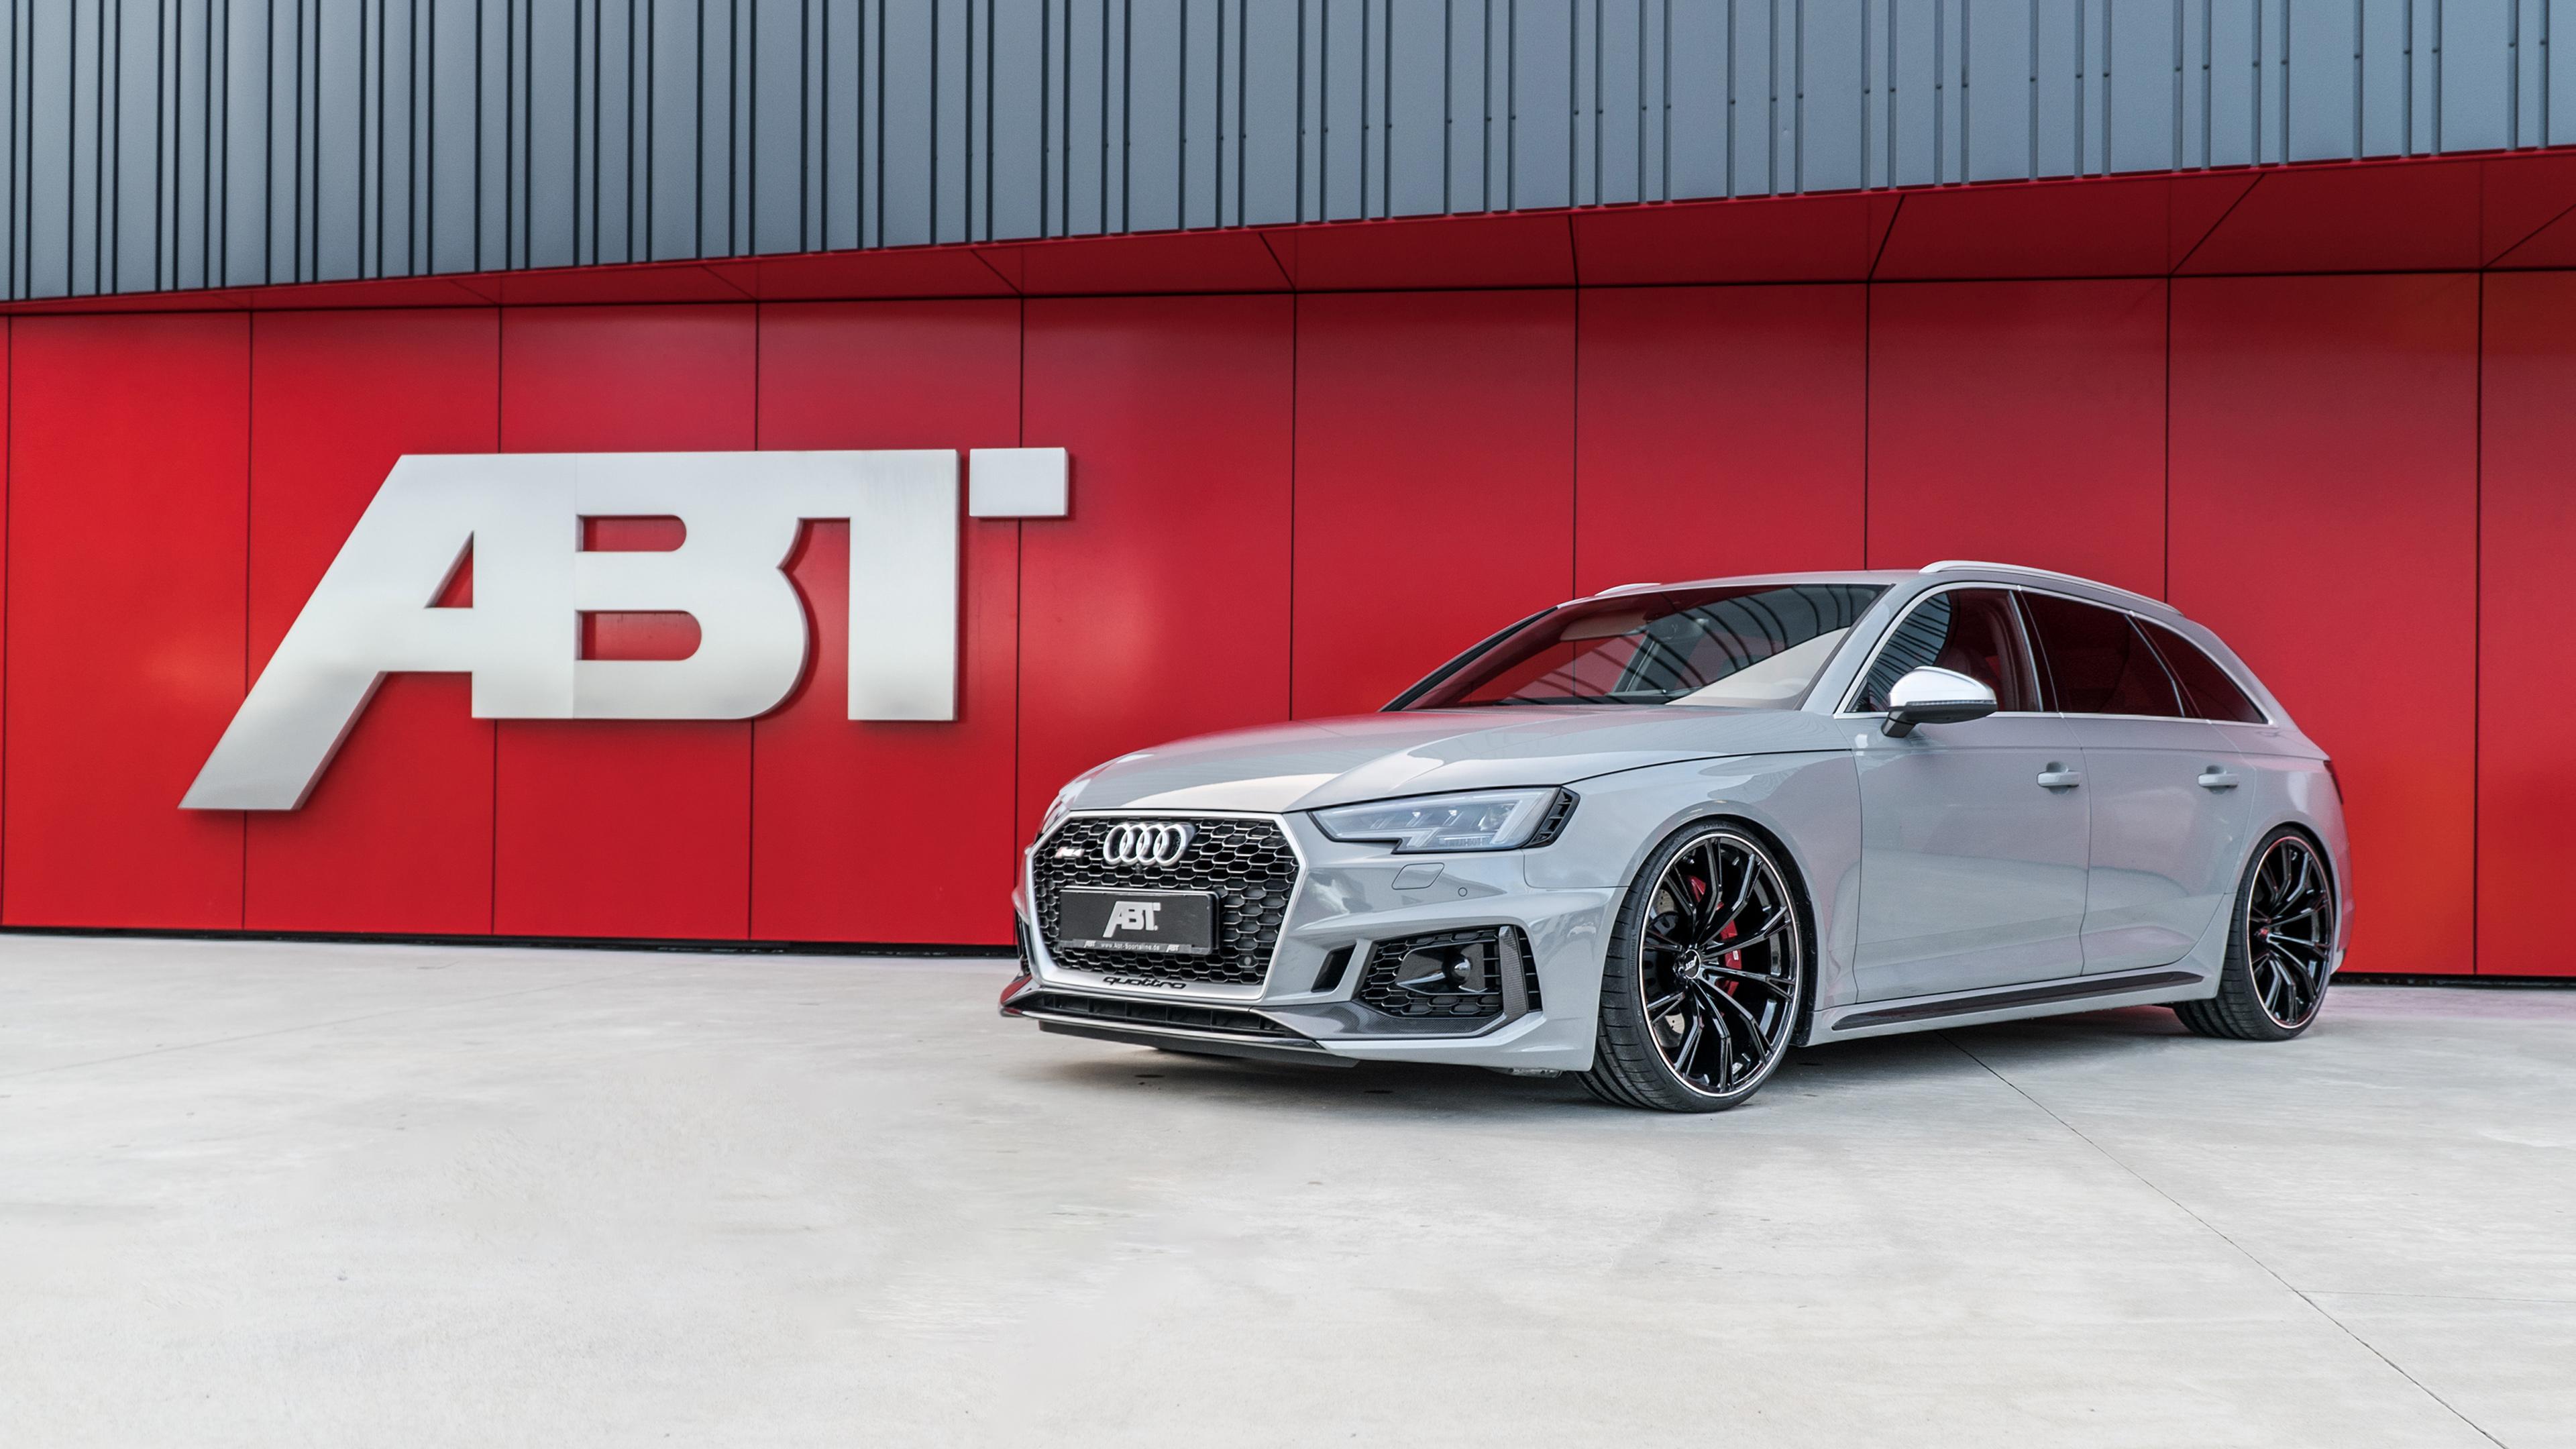 2018 Abt Audi Rs 4 Avant 4k Wallpaper Hd Car Wallpapers Id 9522